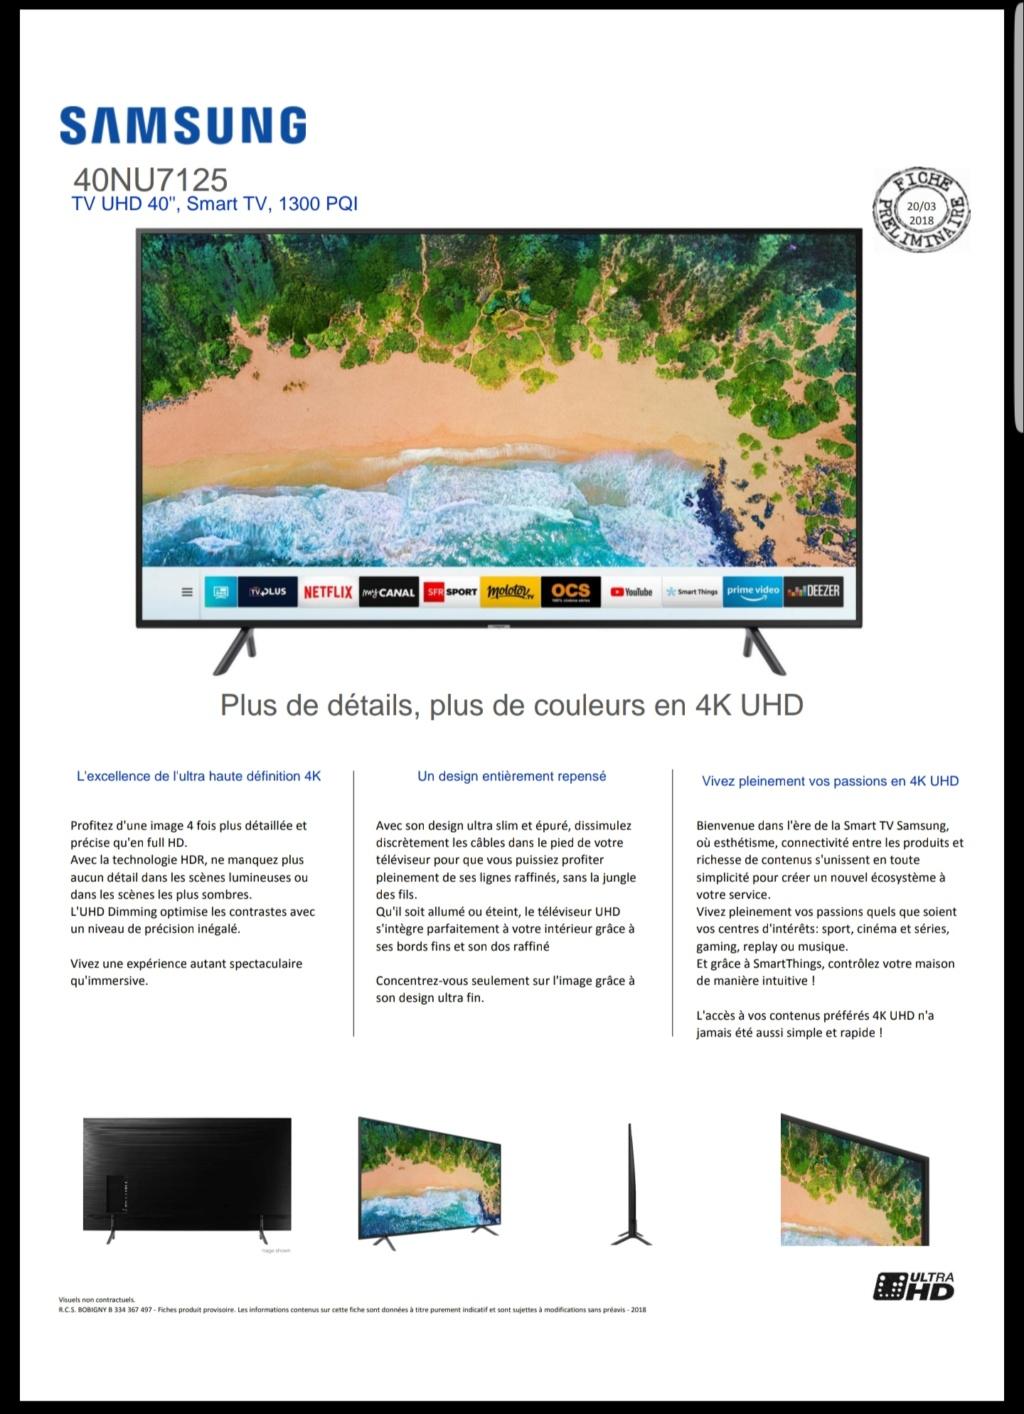 [INFO] TV SAMSUNG 40 NU 7125 20181033